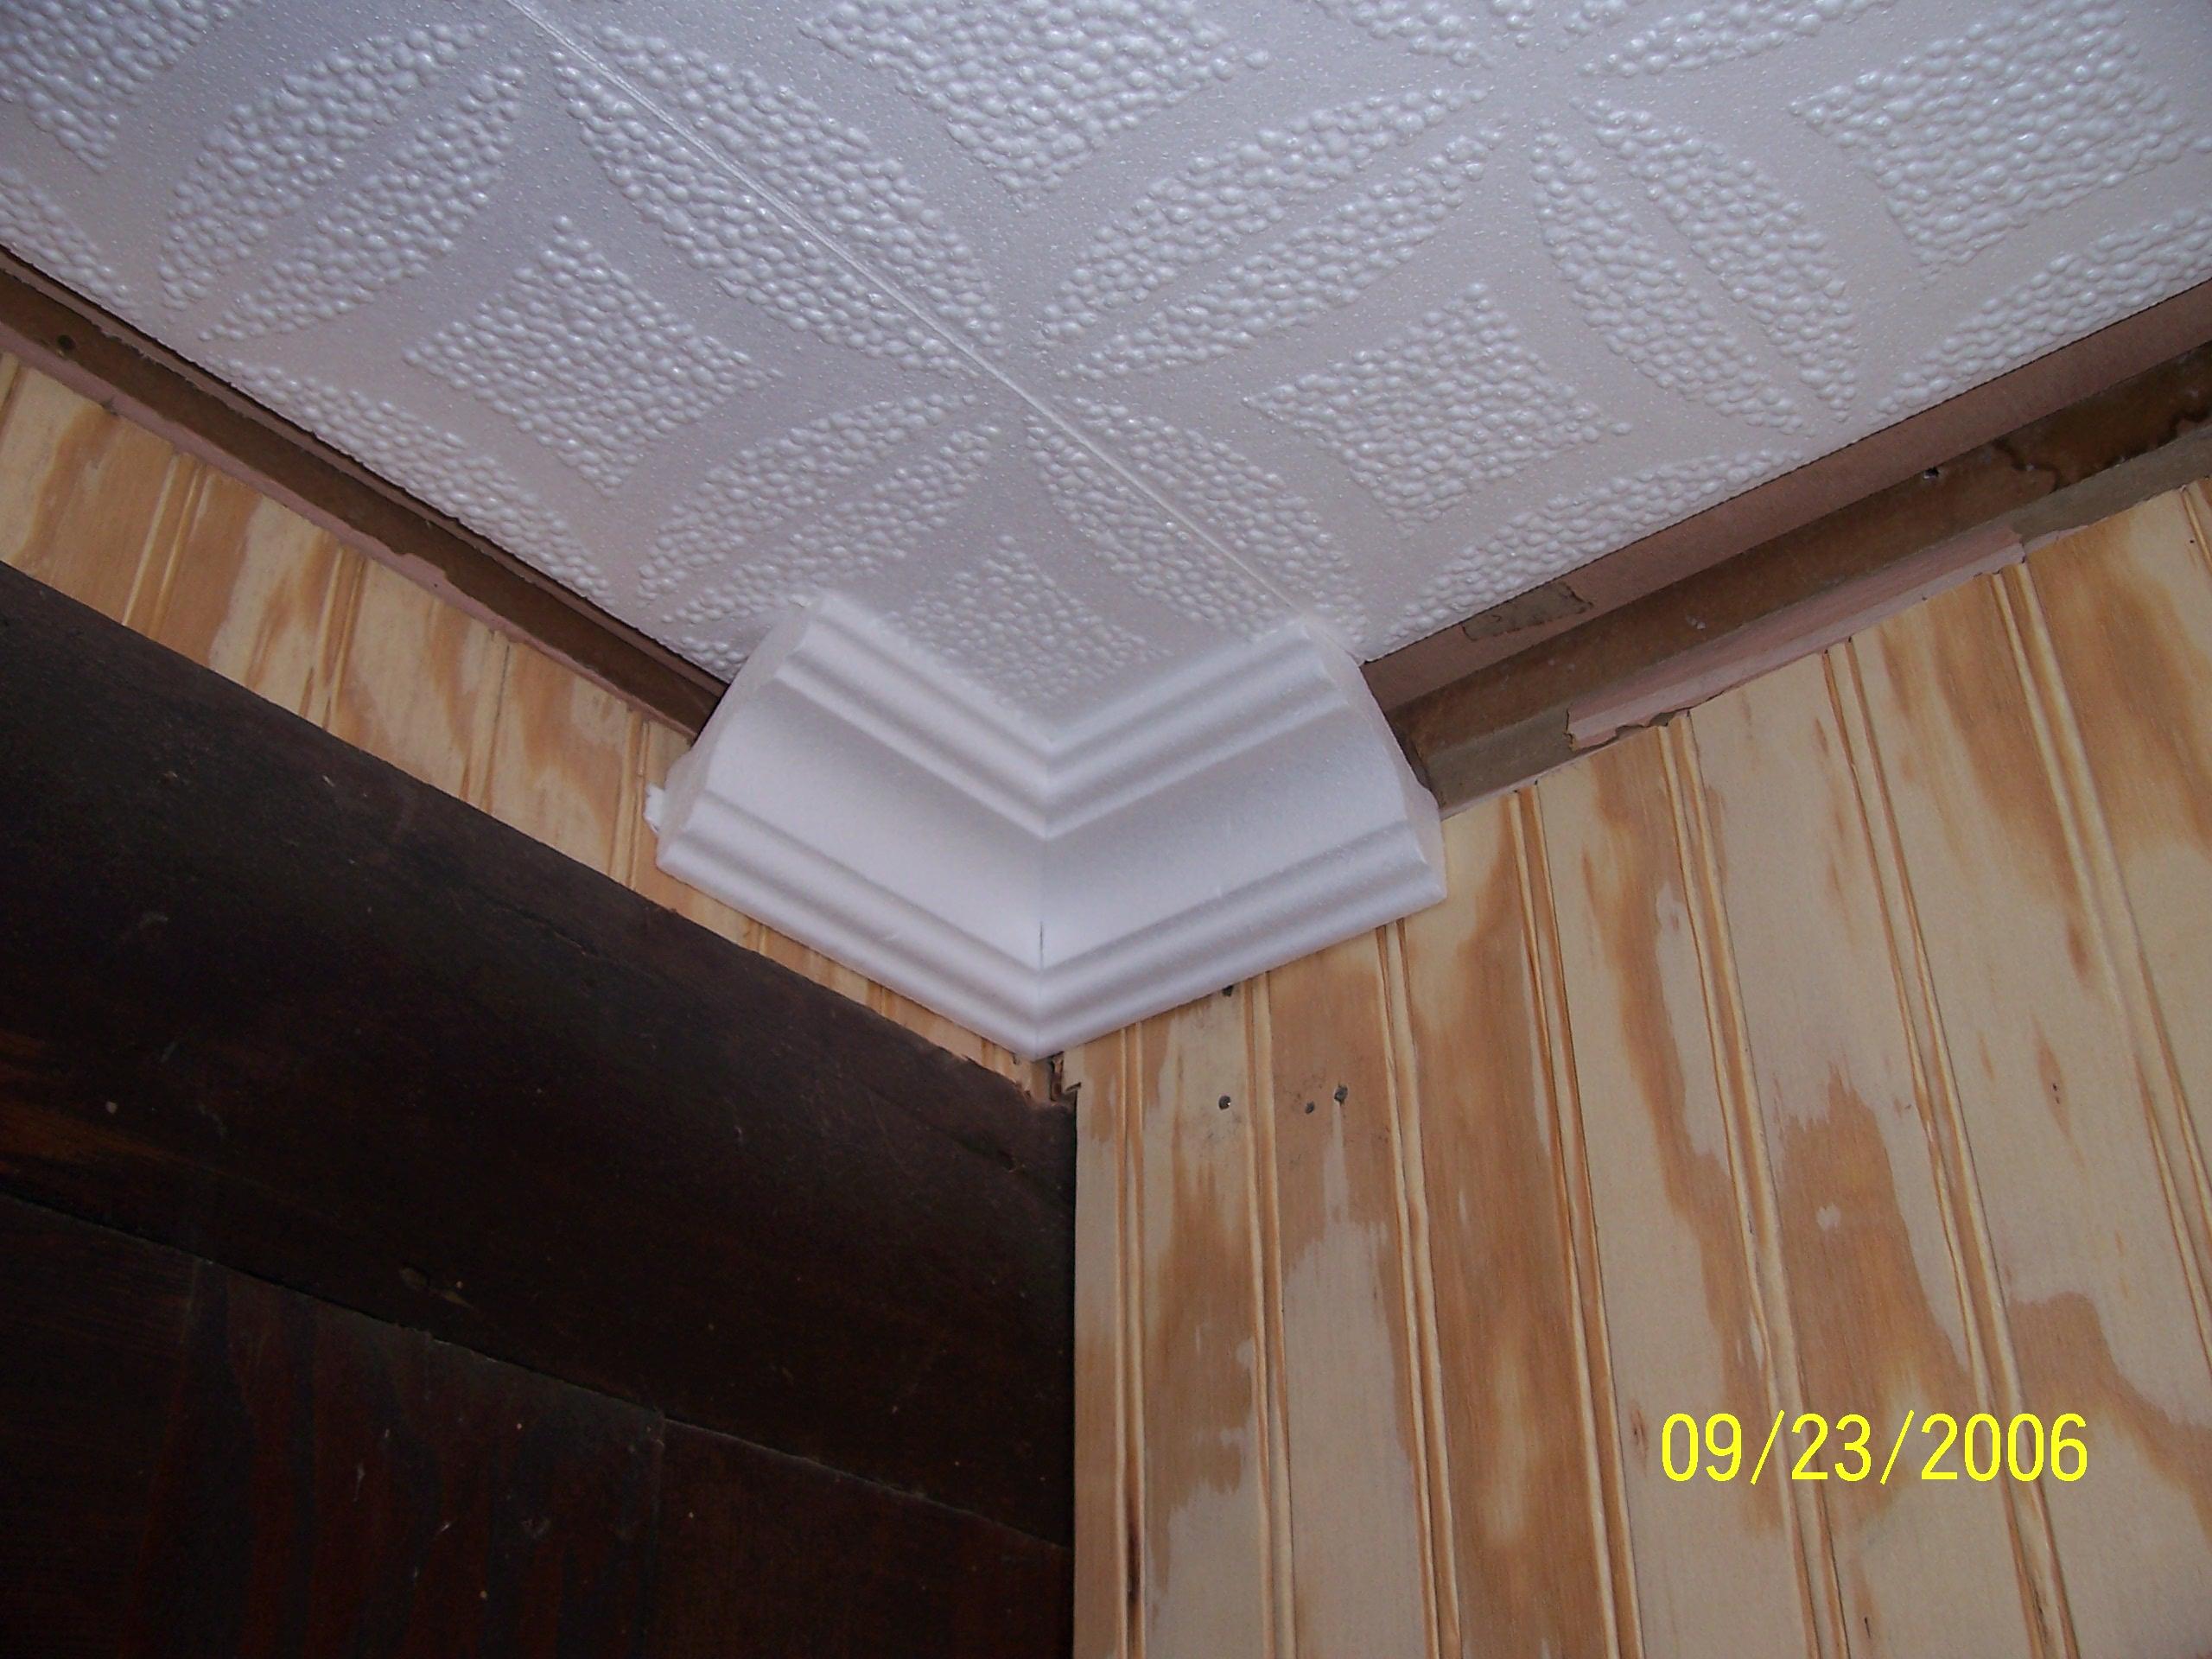 Styrofoam Molding Installed Ceiling Tiles By Us